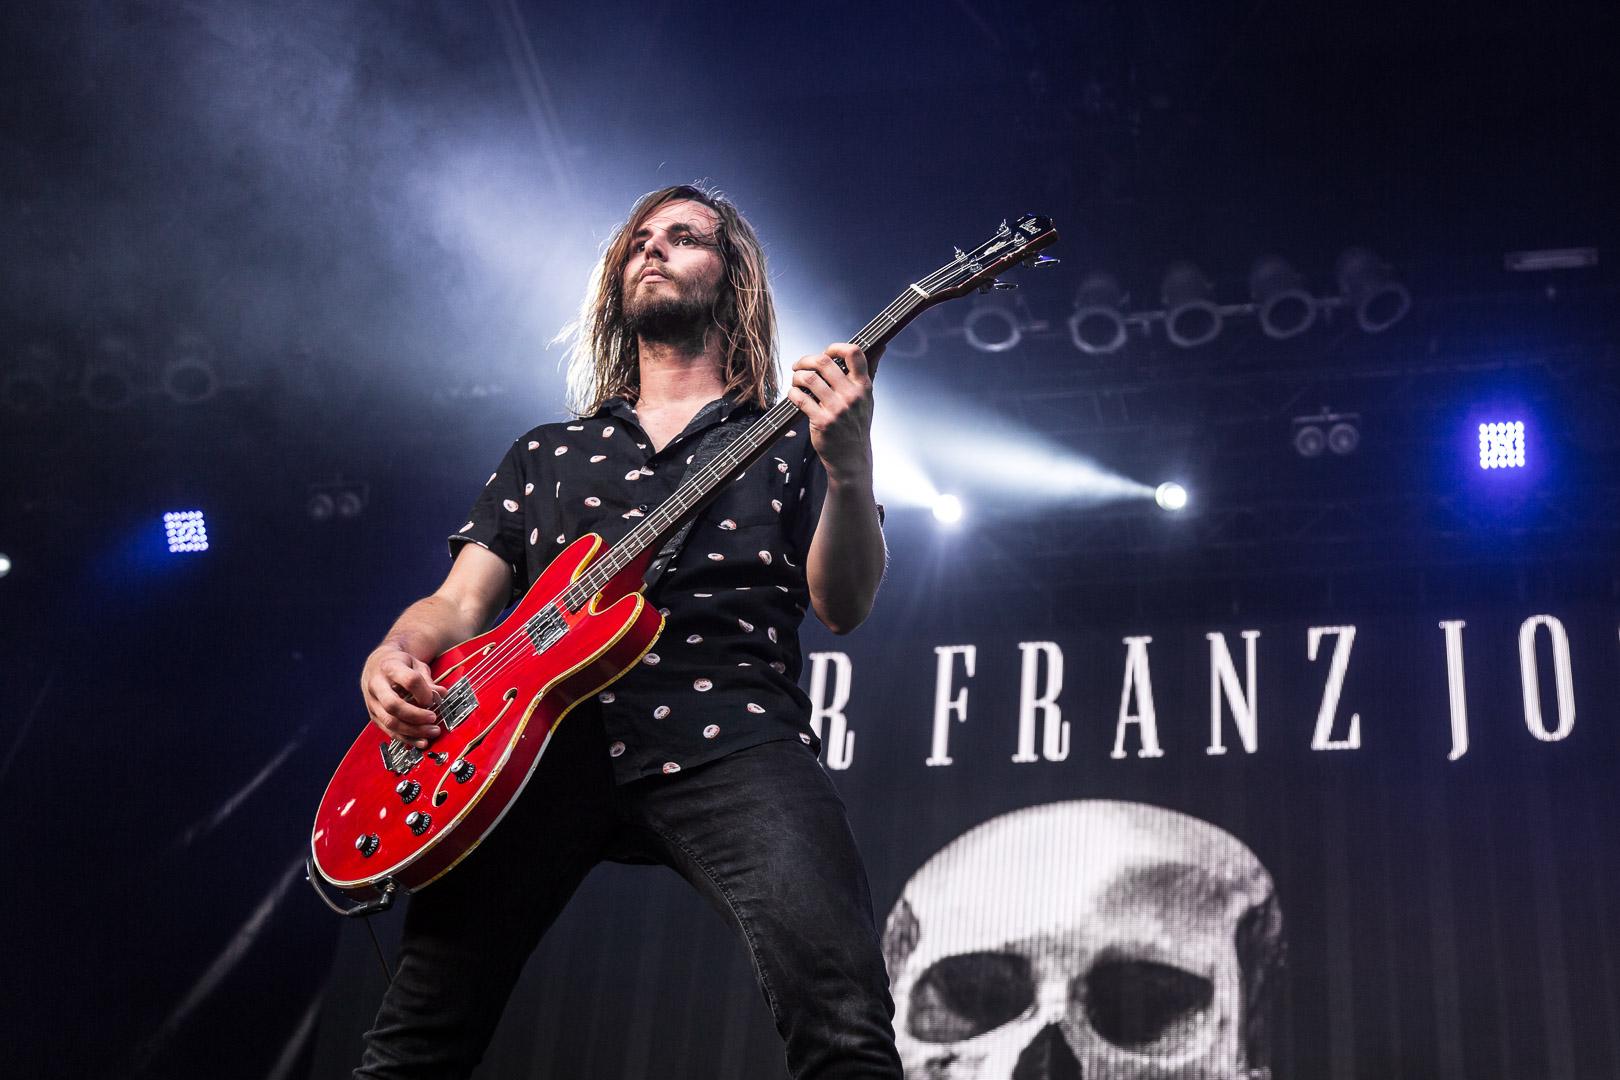 pete of kaiser franz josef live in budapest 2018